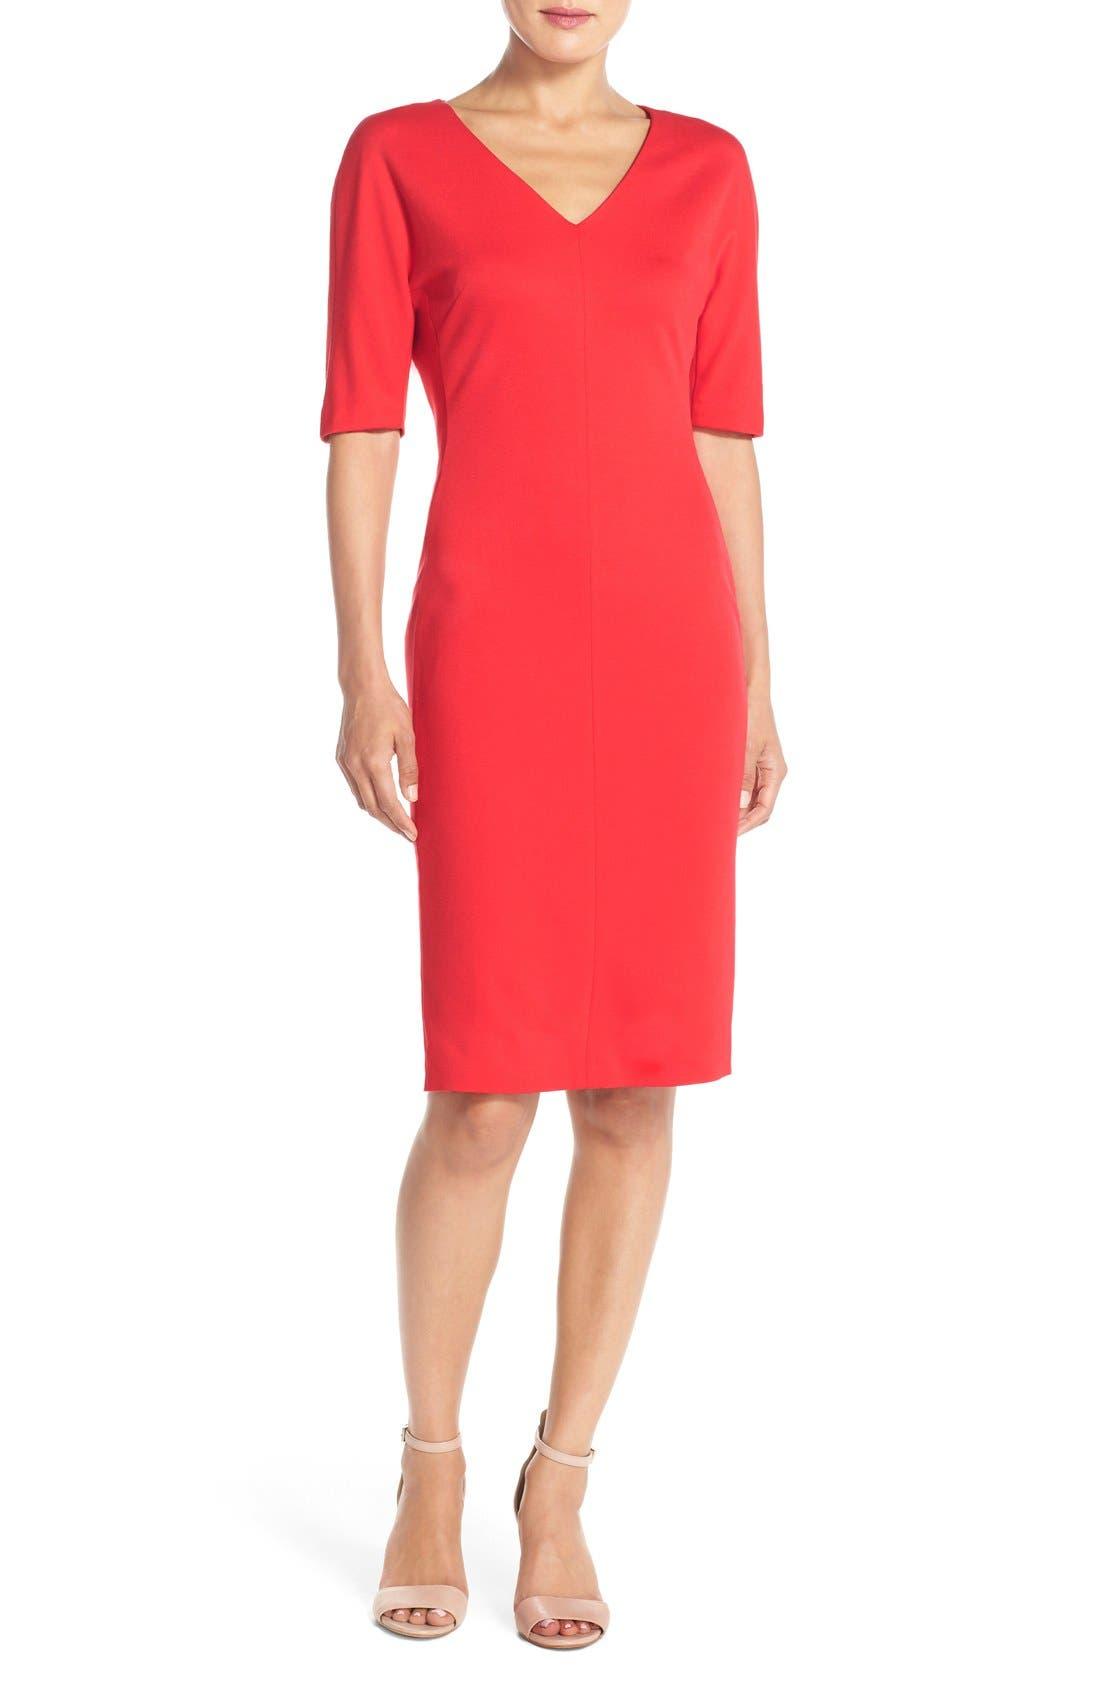 Alternate Image 1 Selected - Eliza J V-Neck Crepe Sheath Dress